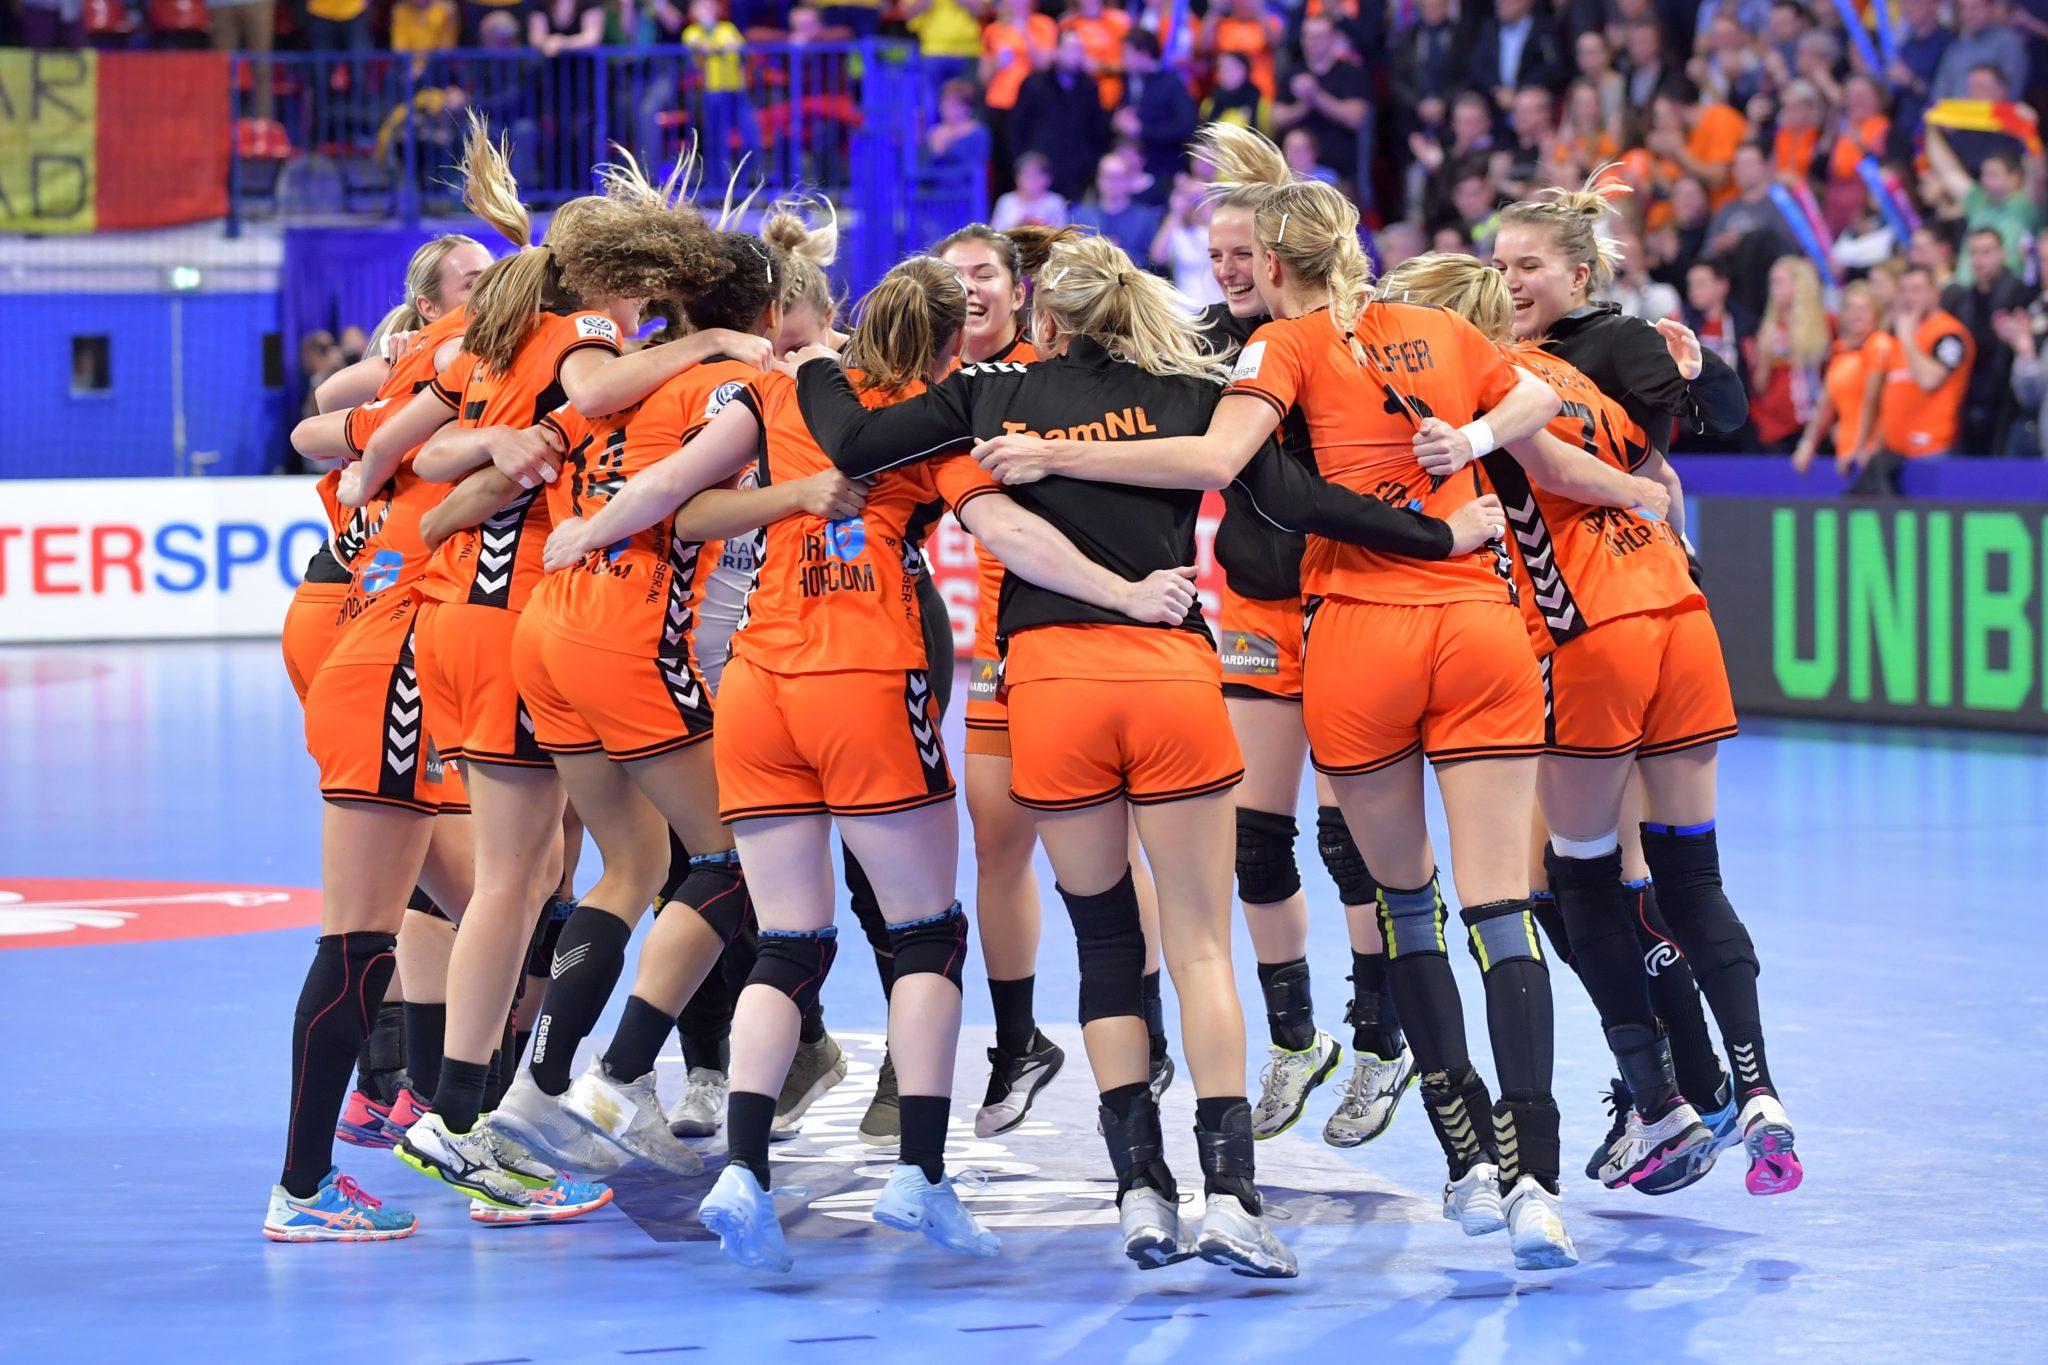 9-12-2018 HANDBAL:NEDERLAND-ROEMENIE:NANCY EK Handbal In Frankrijk, Hoofdronde Groep II Nederland - Roemenie 29-24 Nederland Viert De Overwinning